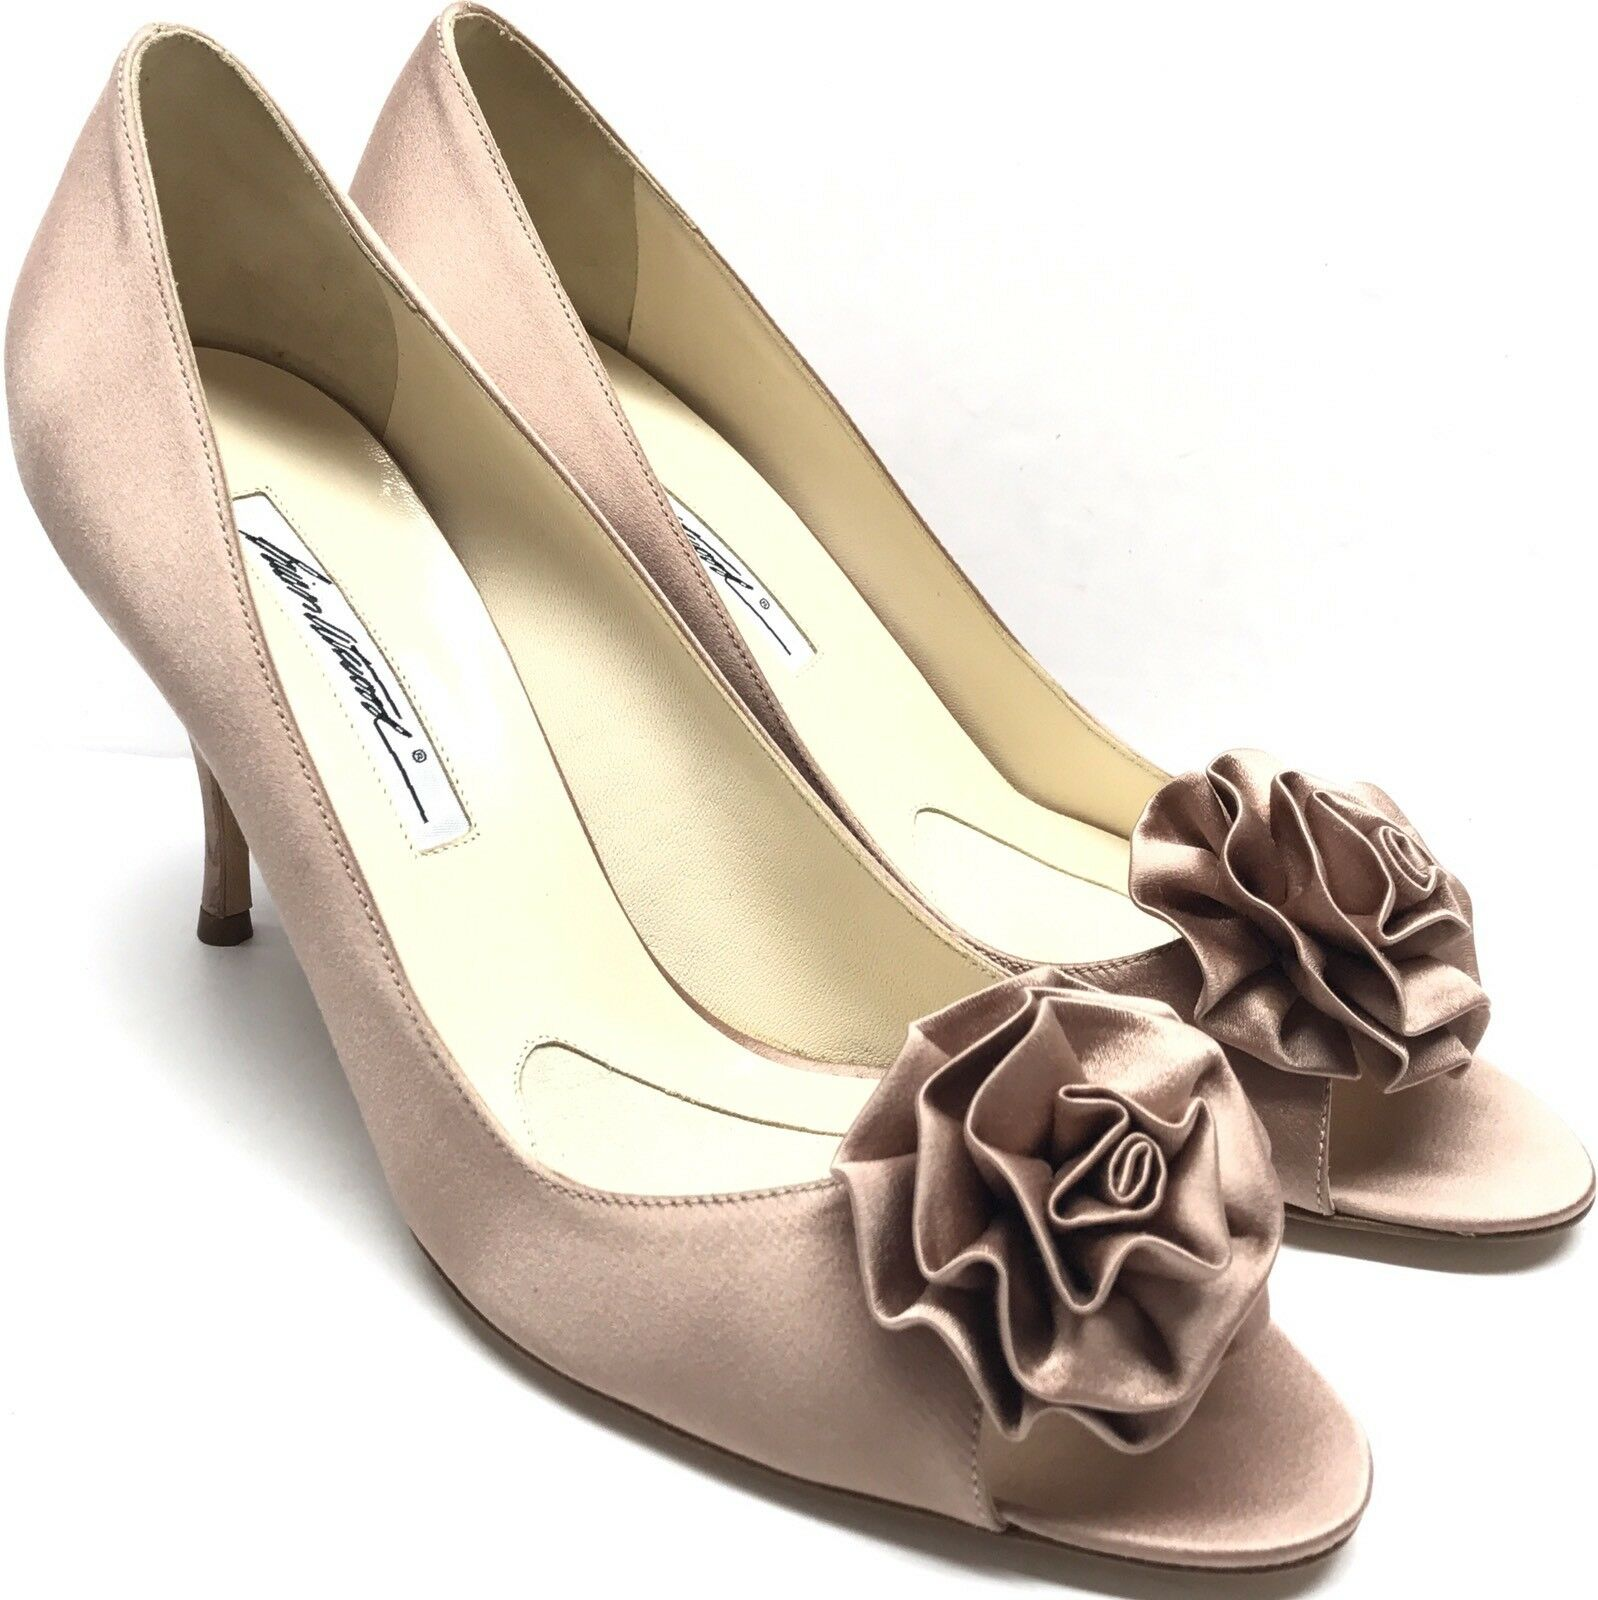 BRIAN ATWOOD Satin Floral Peep Pump Formal Bridal Heel shoes 40 10